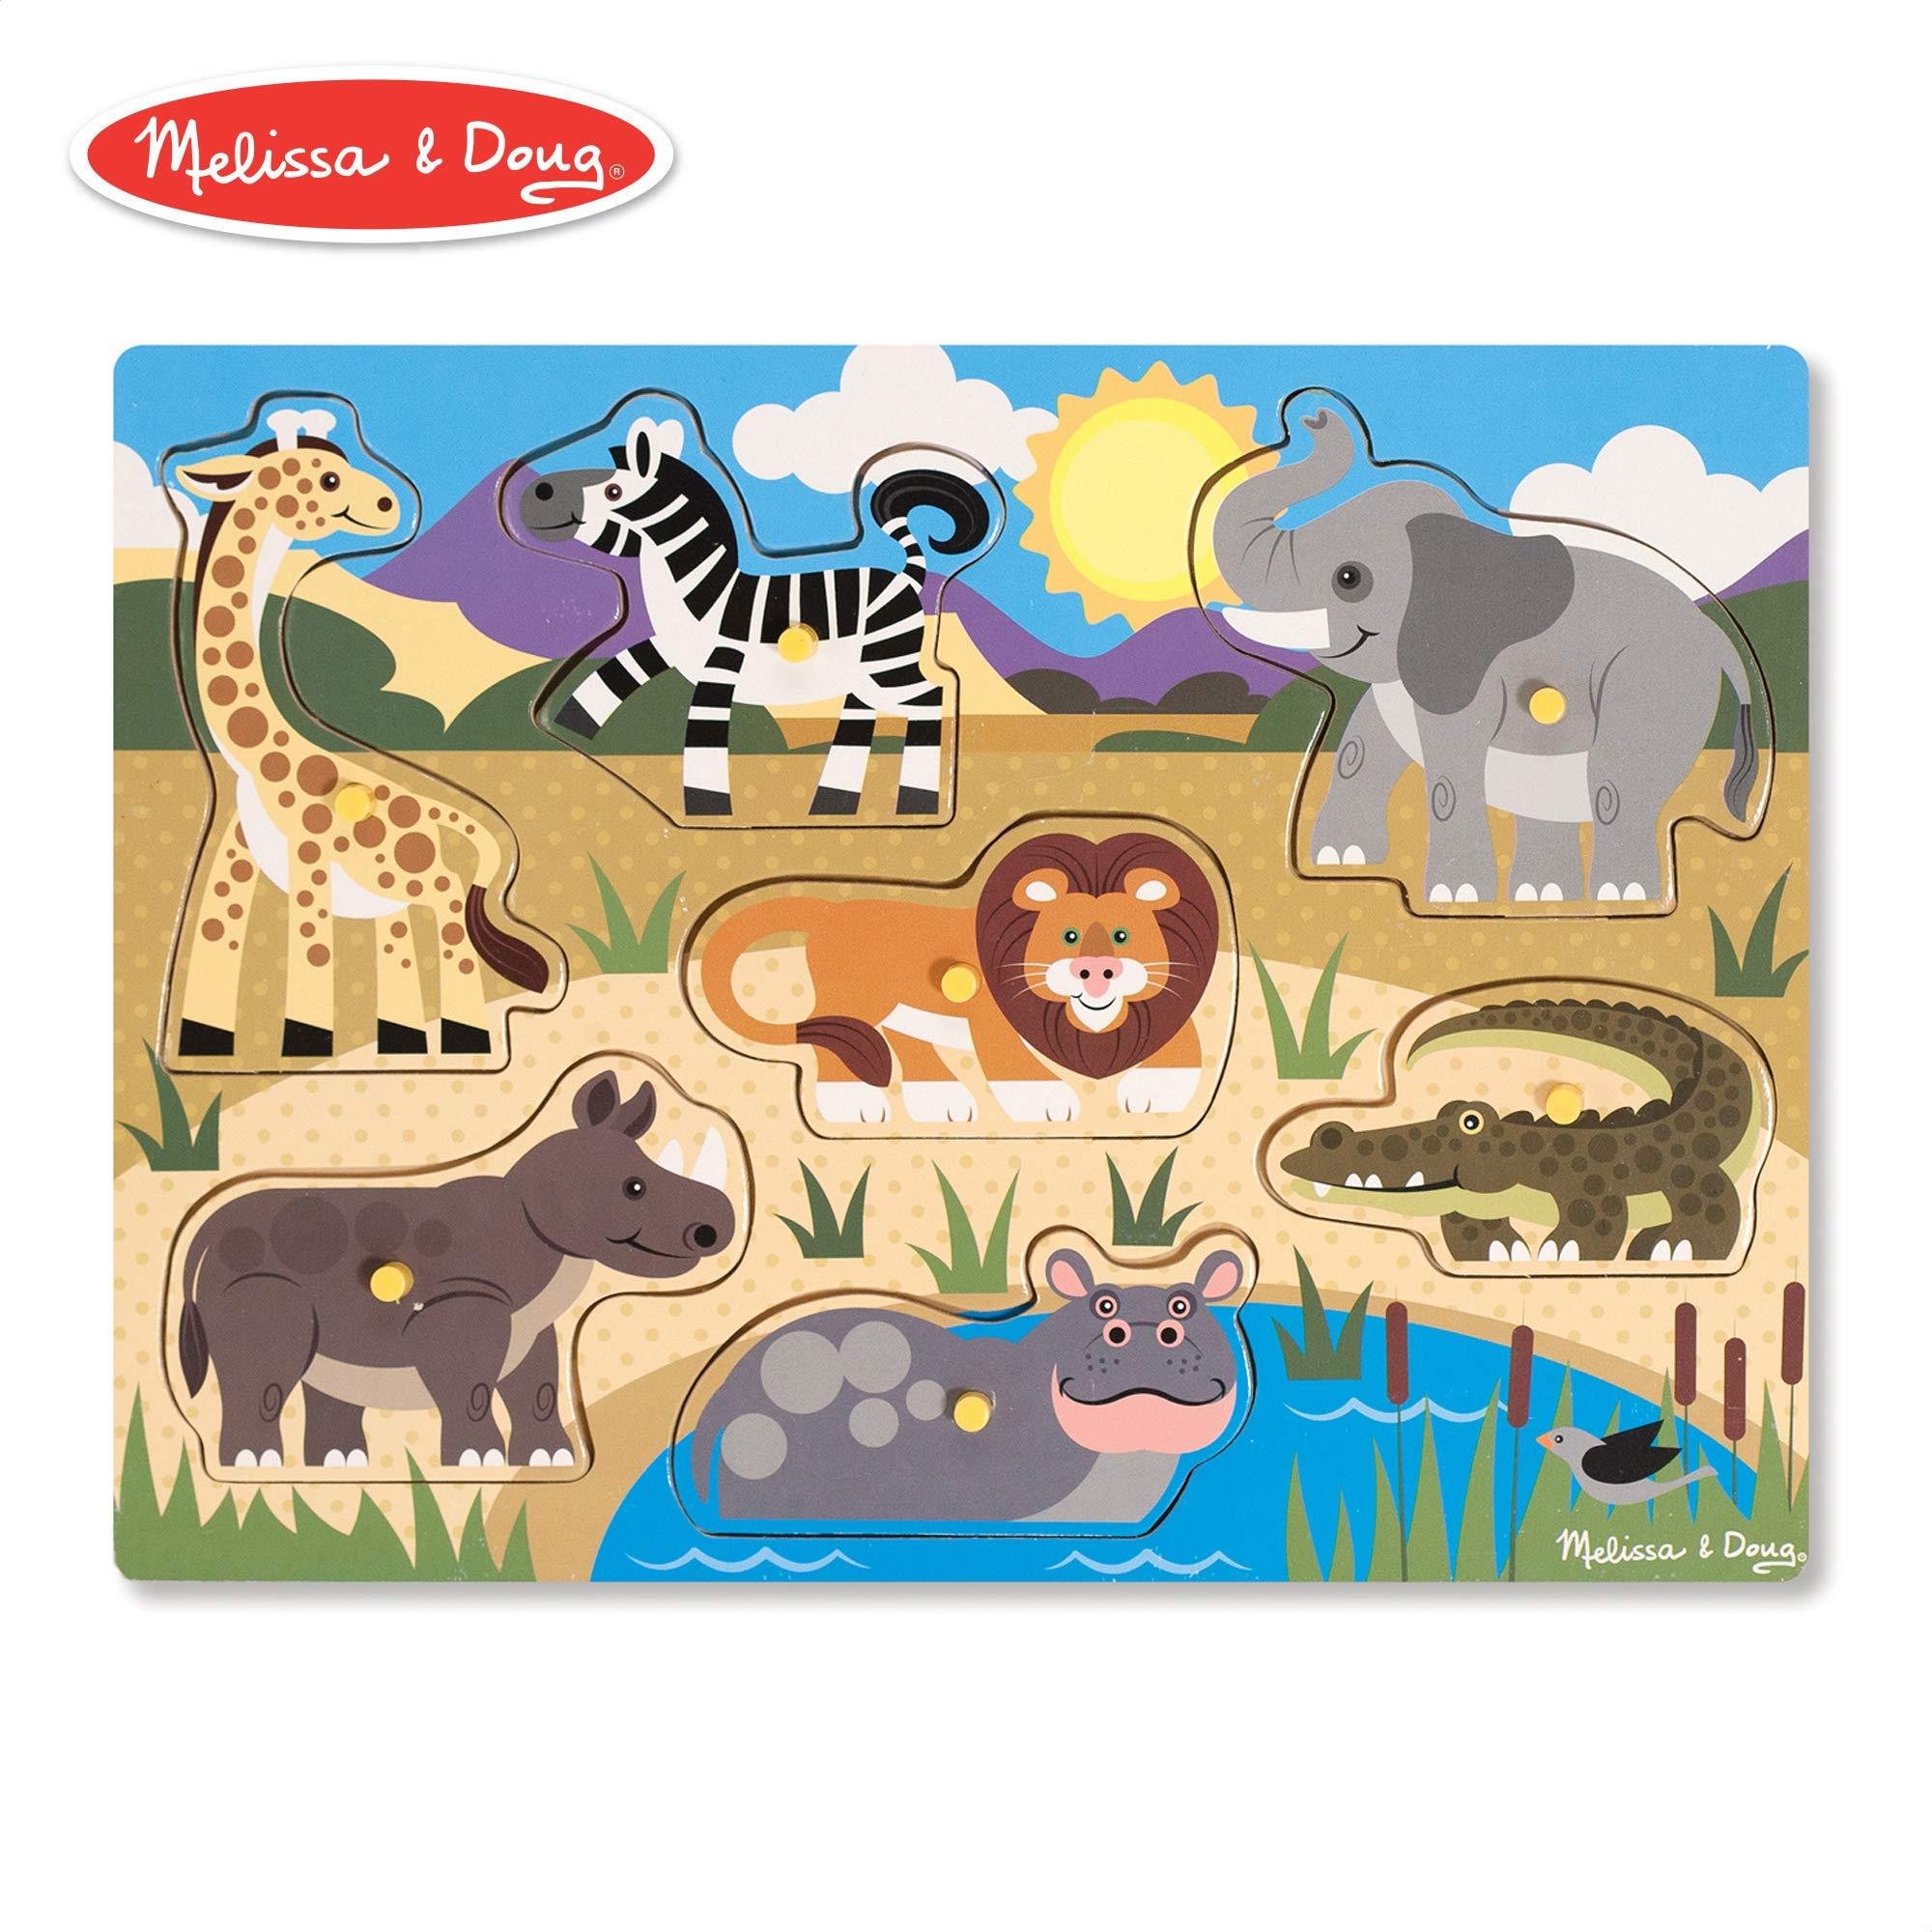 Melissa & Doug Safari Peg Puzzle (Colorful Animal Artwork, Extra-Thick Wooden Construction, 7 Pieces) product image